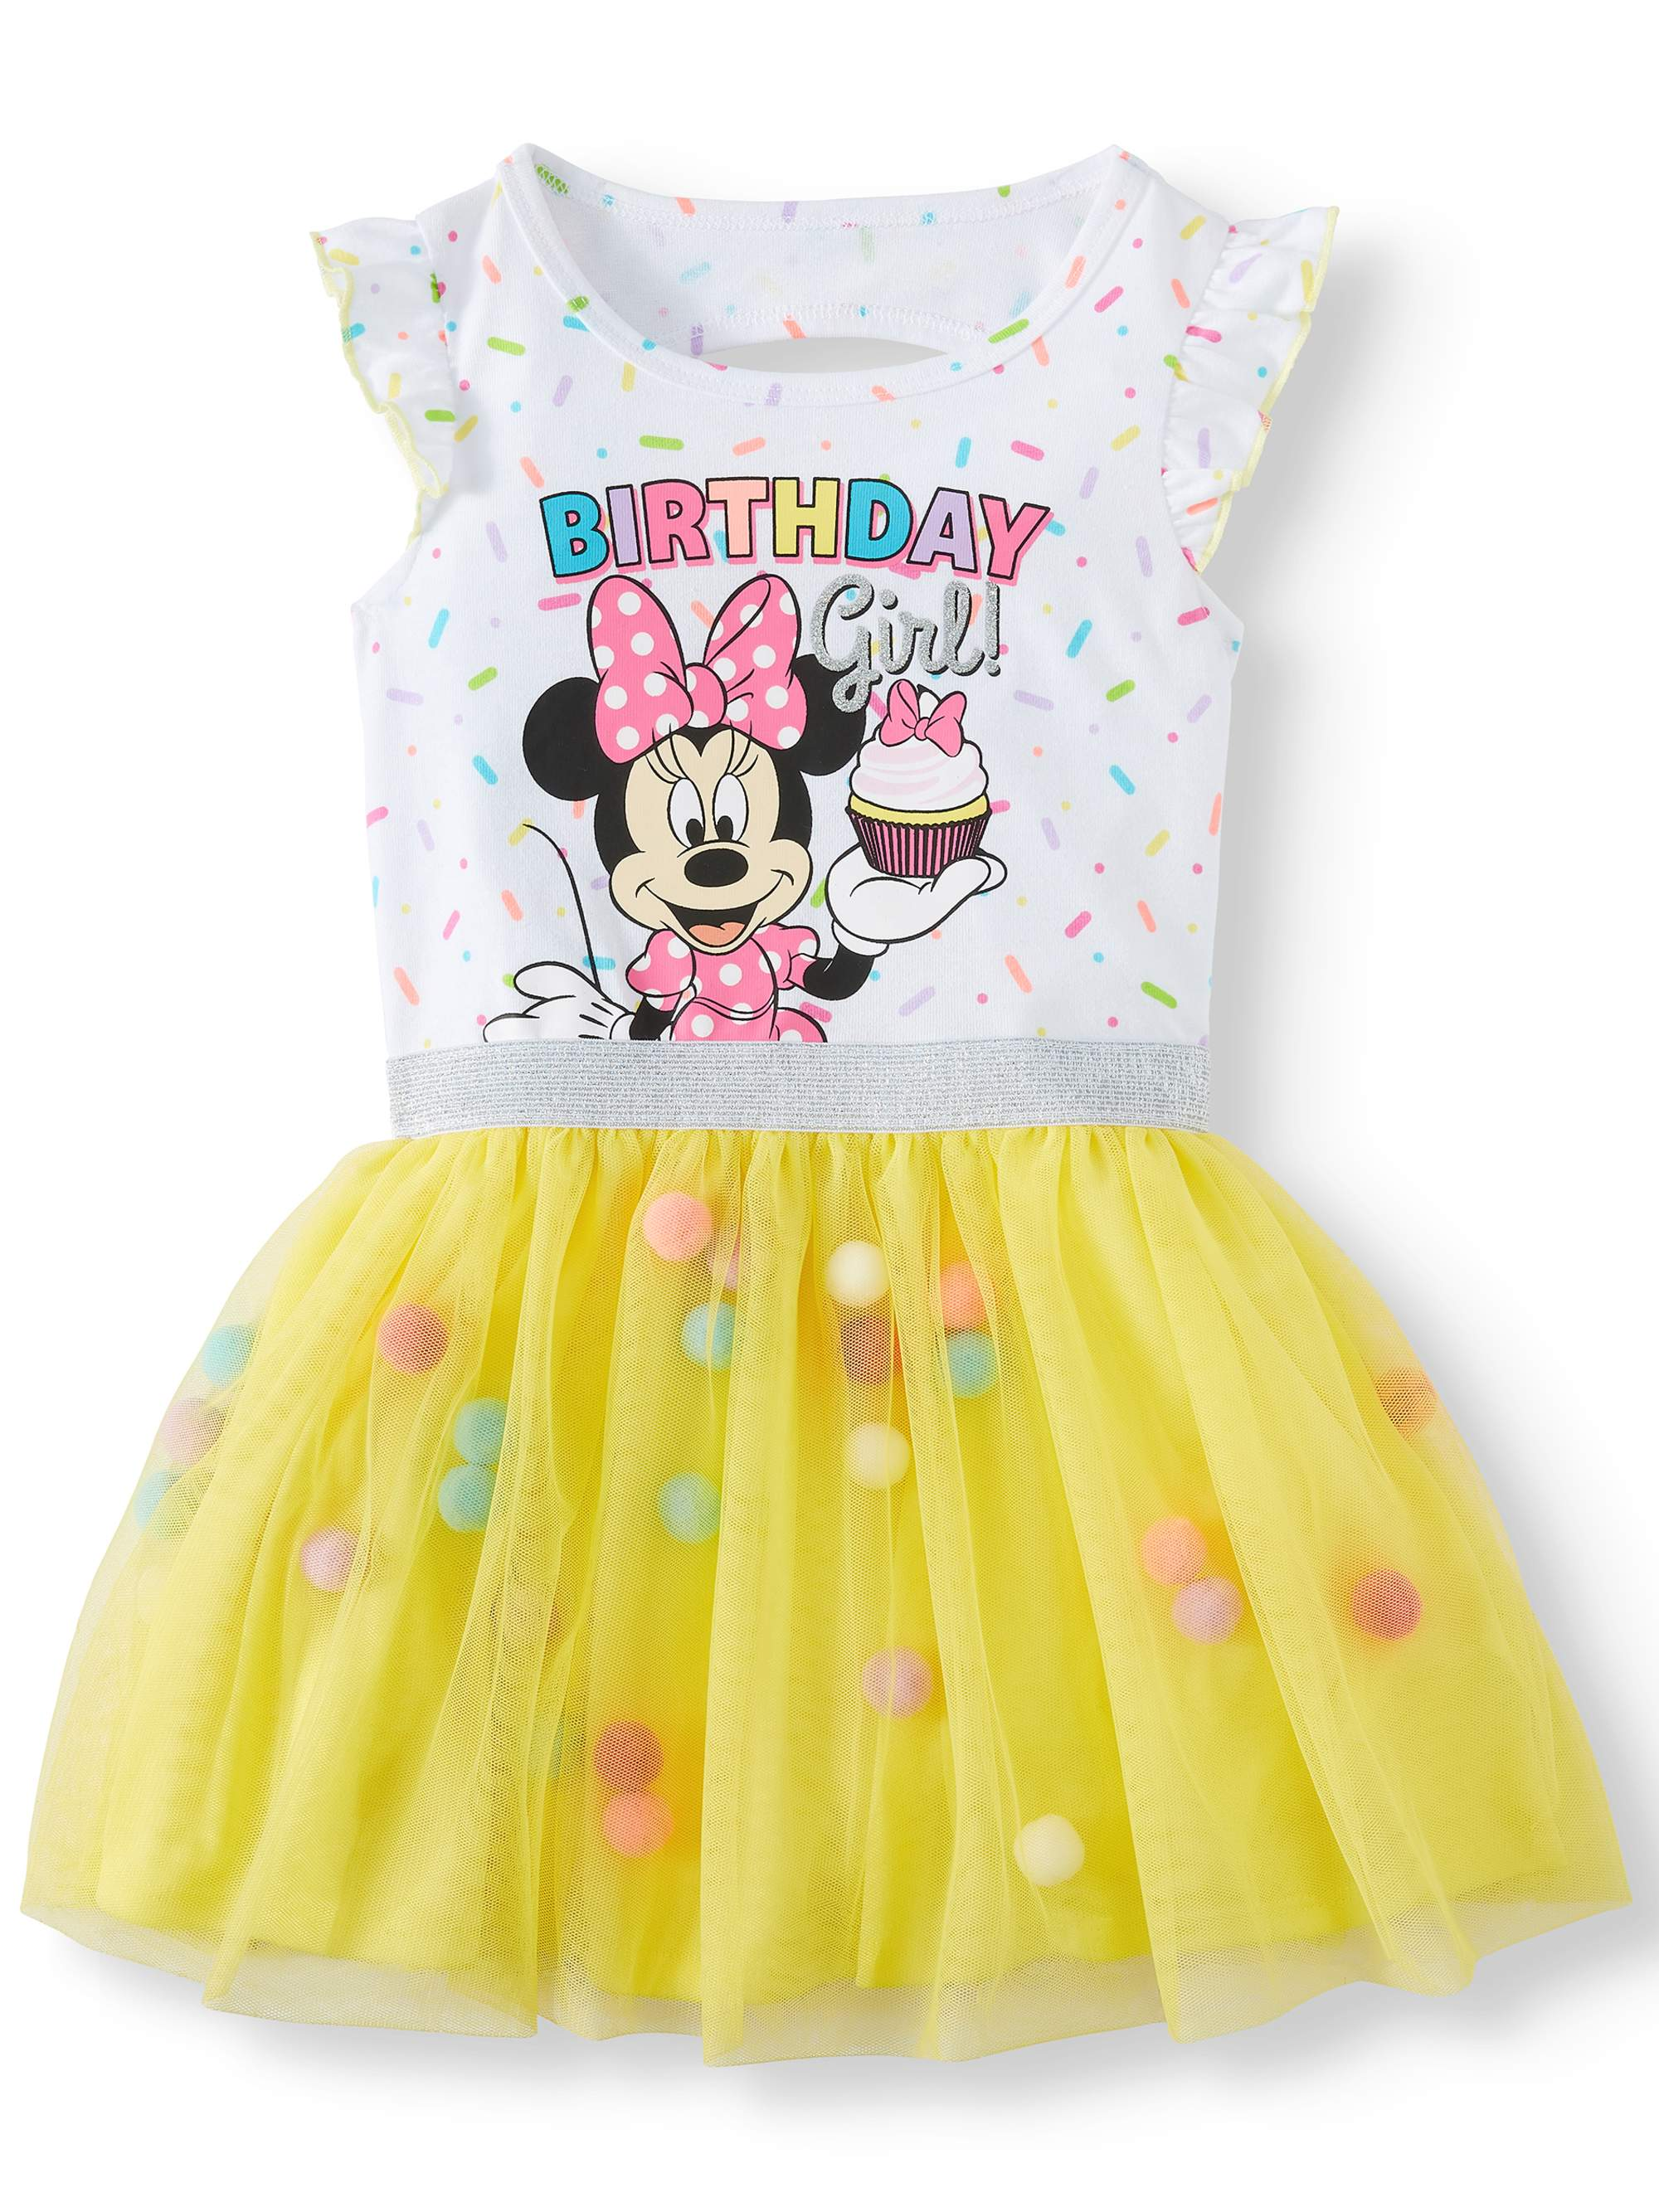 Minnie Mouse Minnie Mouse Birthday Girl Tutu Dress Toddler Girls Walmart Com Walmart Com